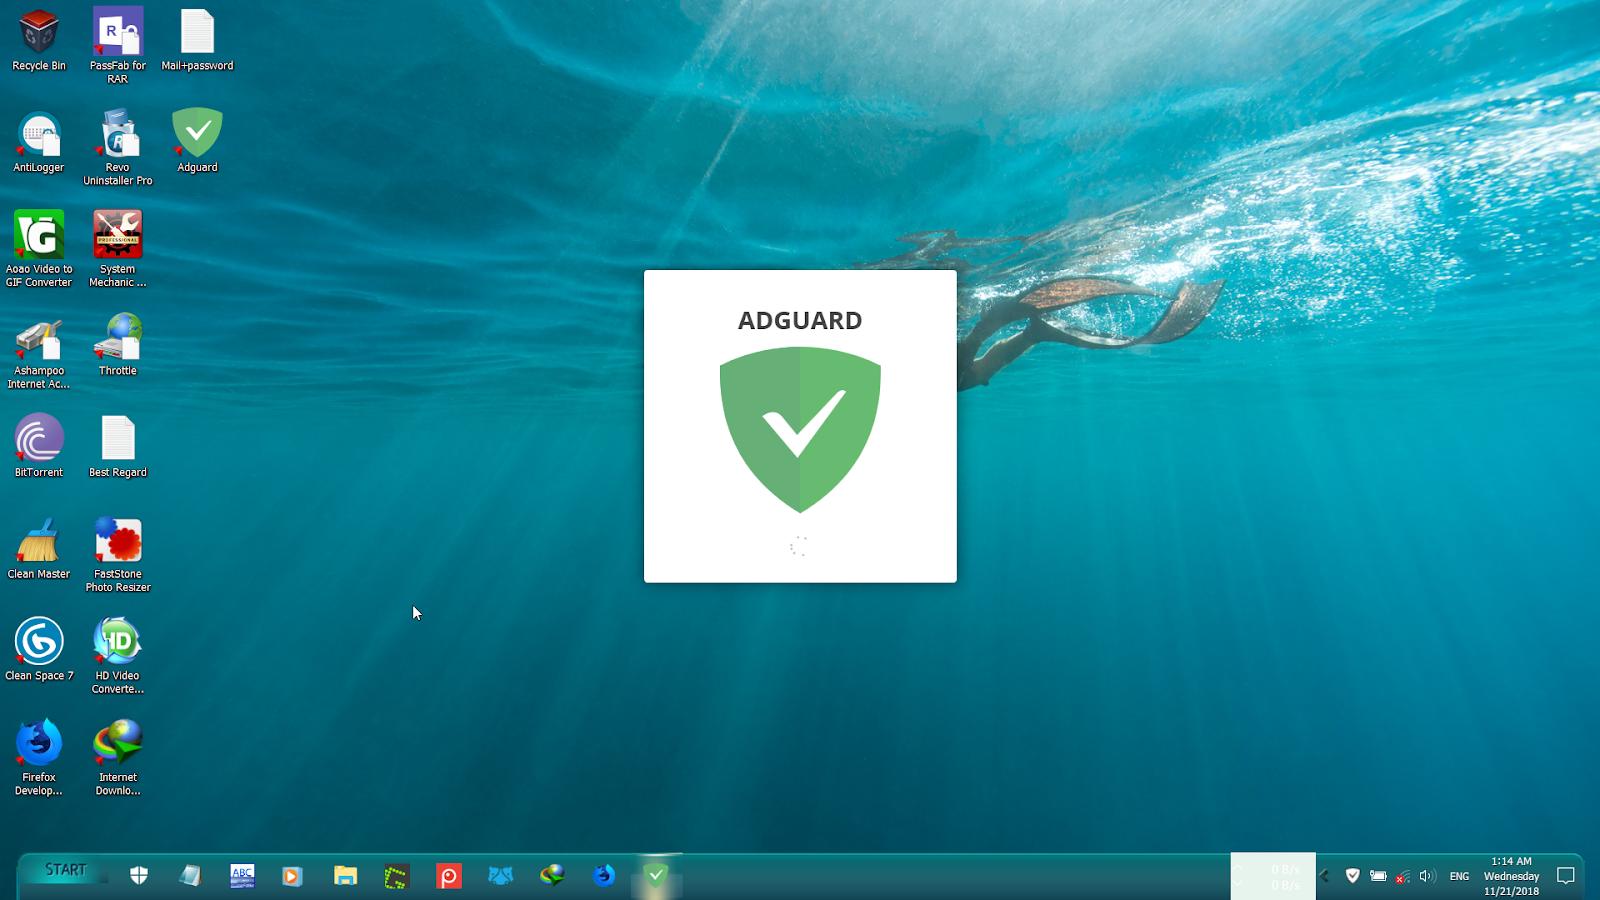 aloneghost-xz : Adguard Premium 6 4 1739 4753 LifeTime License